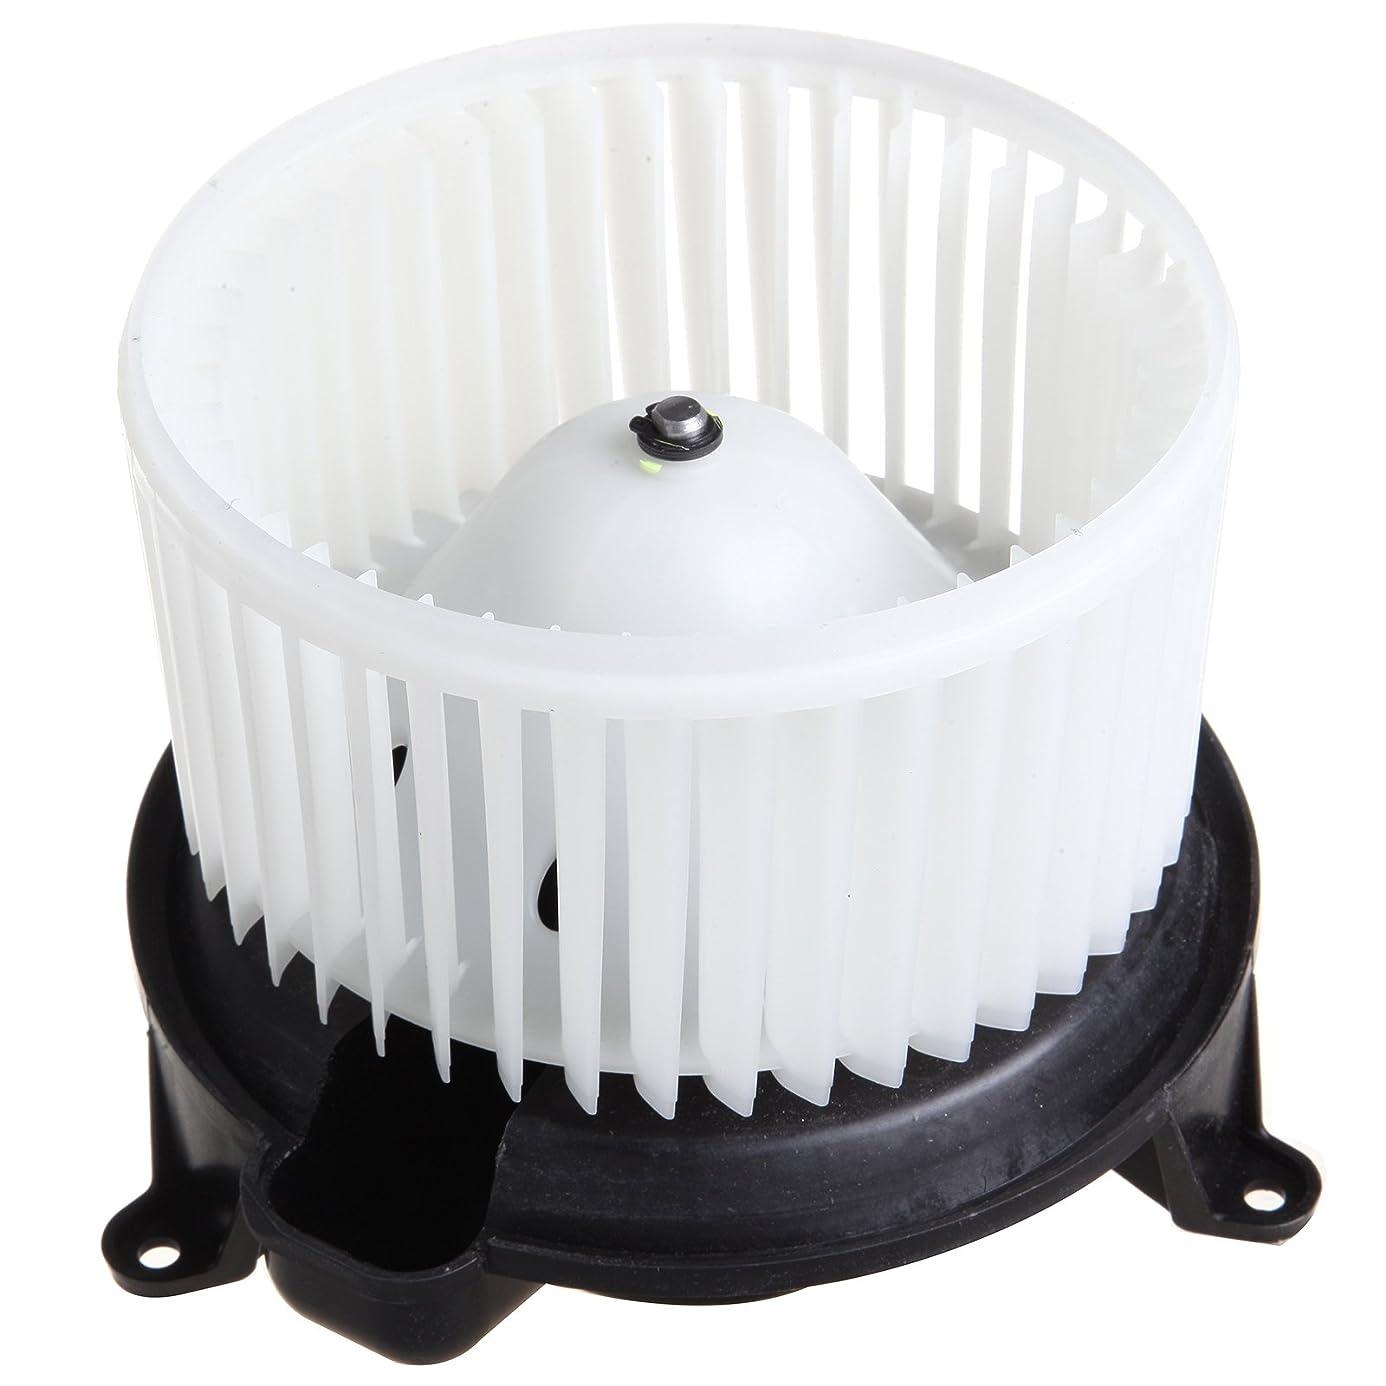 HVAC plastic Heater Blower Motor w/Fan Cage ECCPP for 2004 Nissan Pathfinder 2004-2010 Infiniti QX56 2004-2008 Nissan Titan 2005-2015 Nissan Armada Front bkd6540060